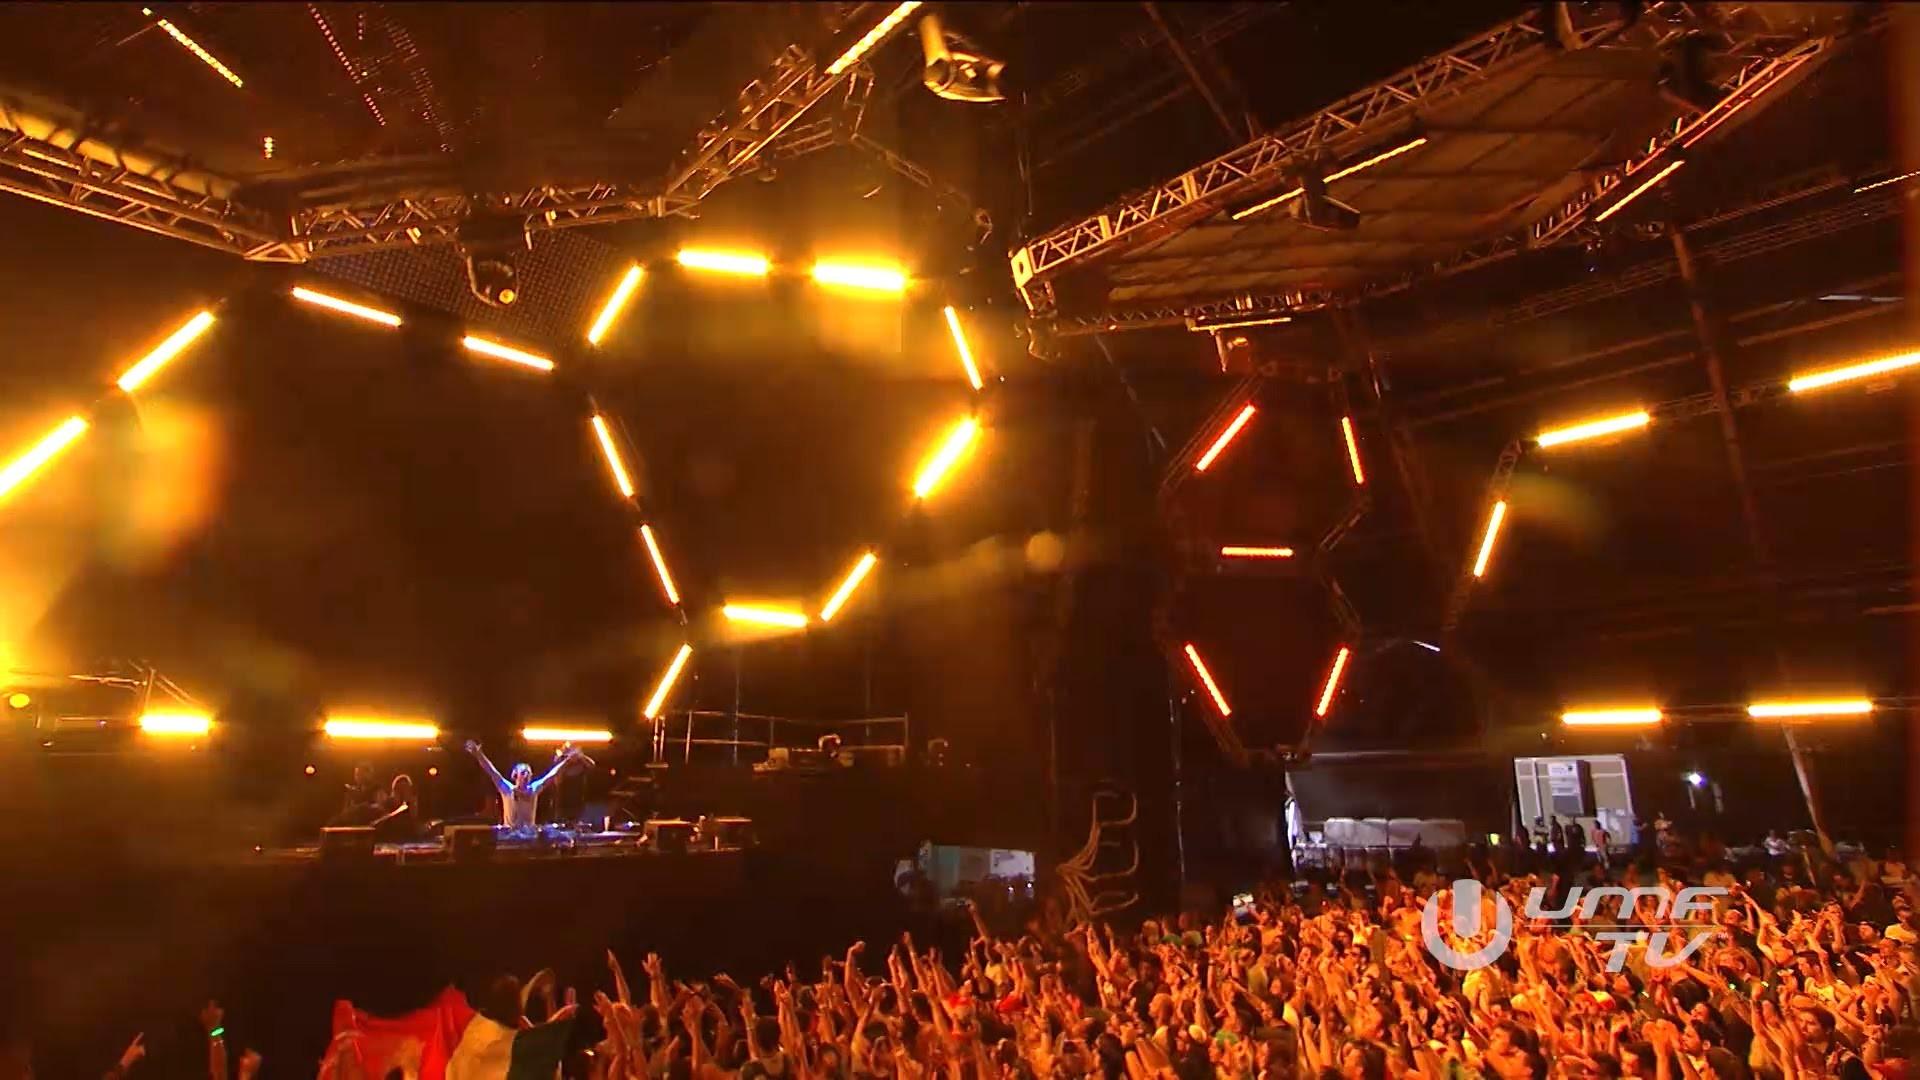 Armin van Buuren – Live @ Ultra Music Festival Miami 2016, I'm In